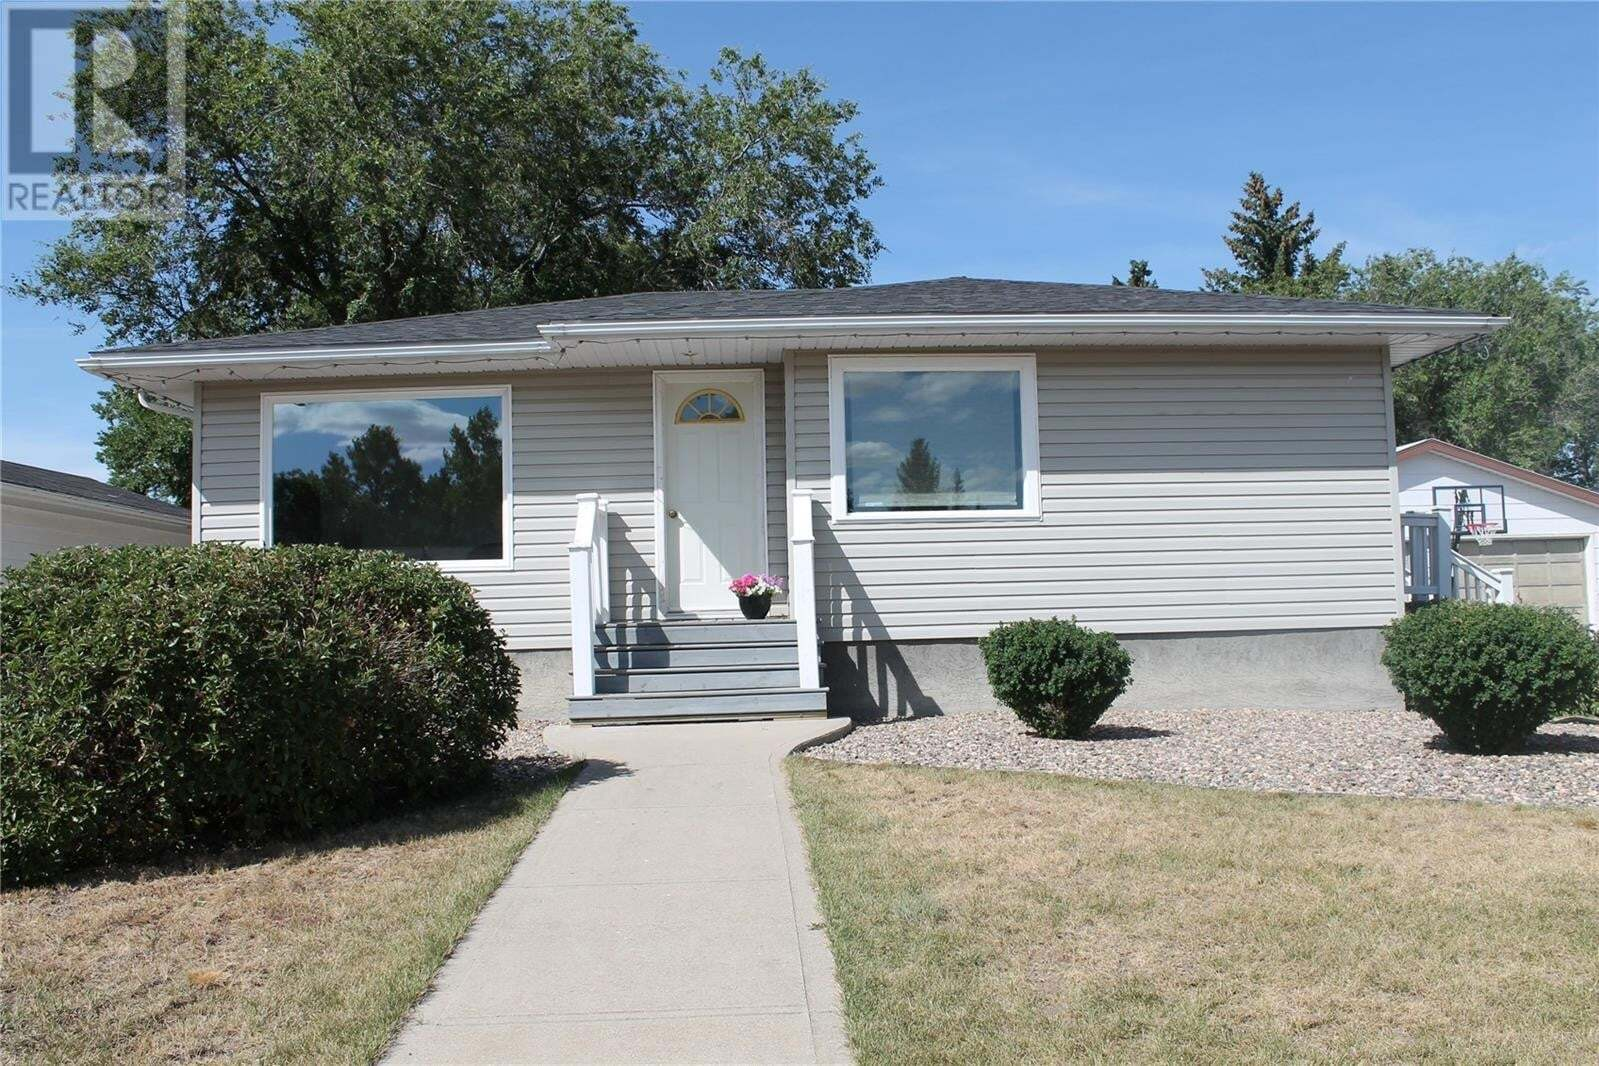 House for sale at 257 6th Ave E Gravelbourg Saskatchewan - MLS: SK826577